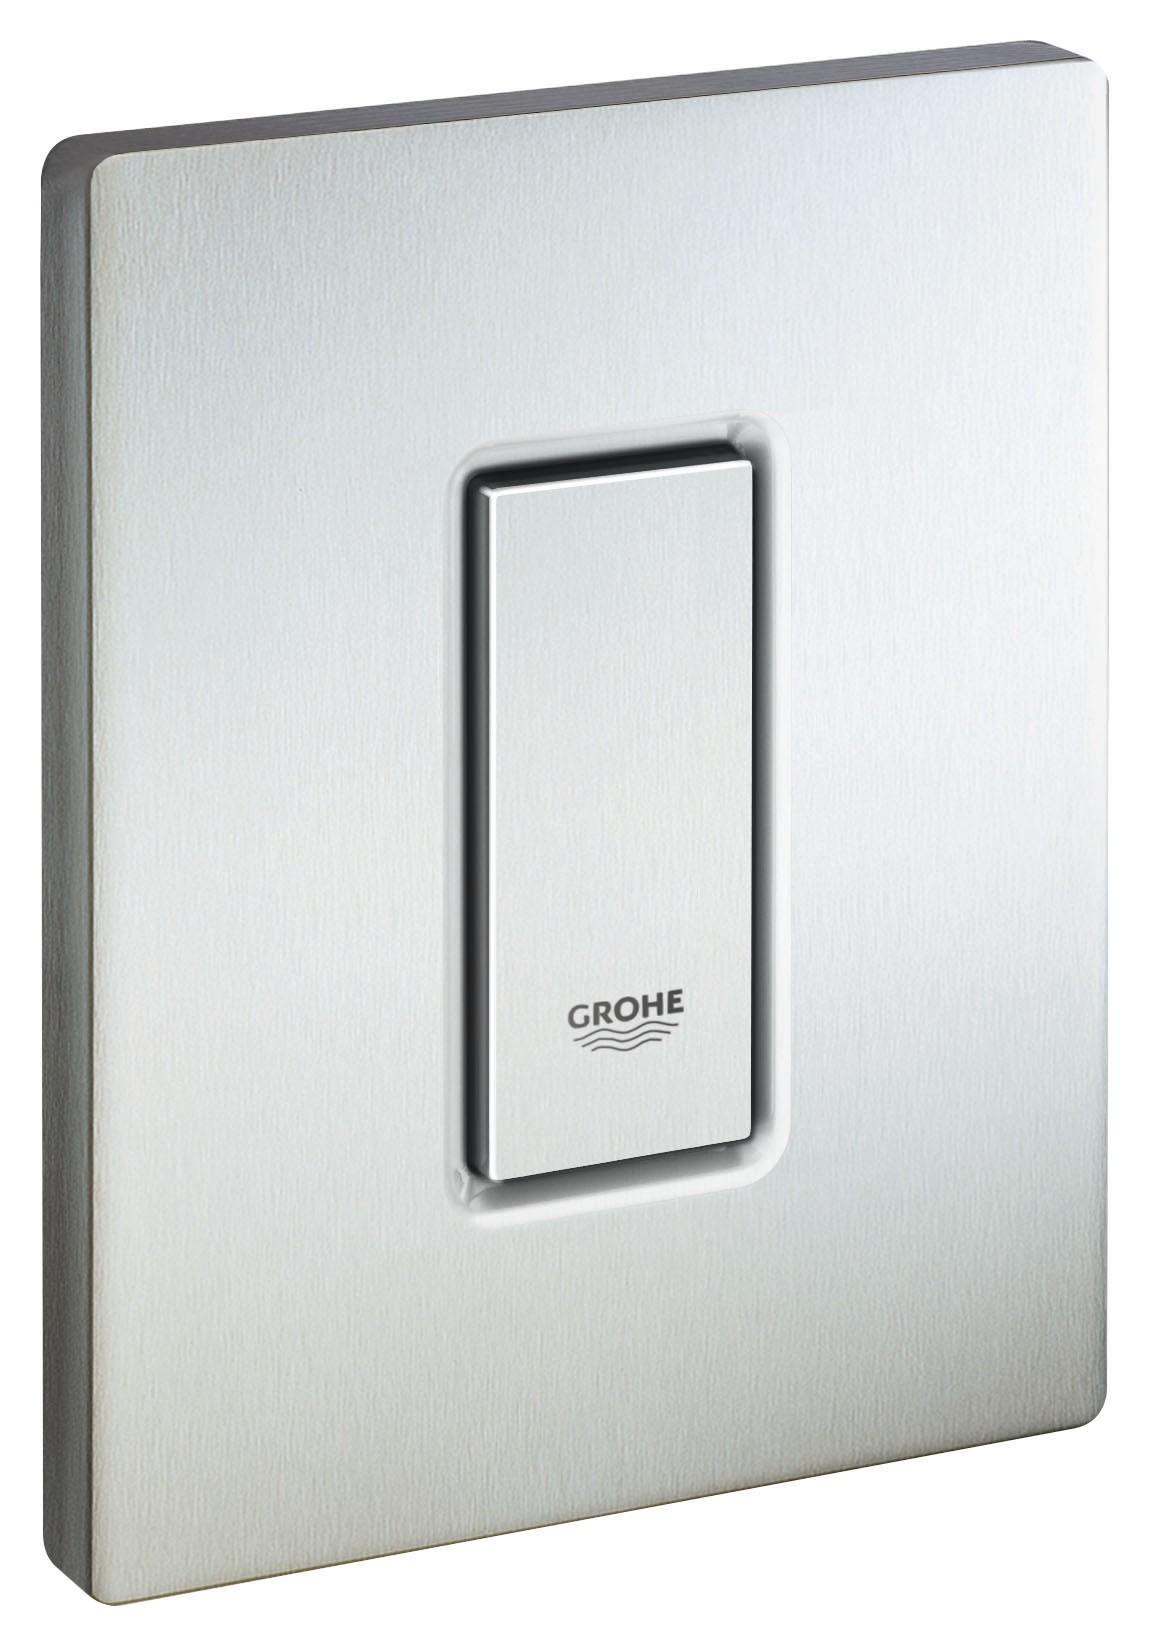 Grohe 38784SD0 Skate Cosmopolitan (1 режим смыва), нержавеющая сталь (38784SD0)